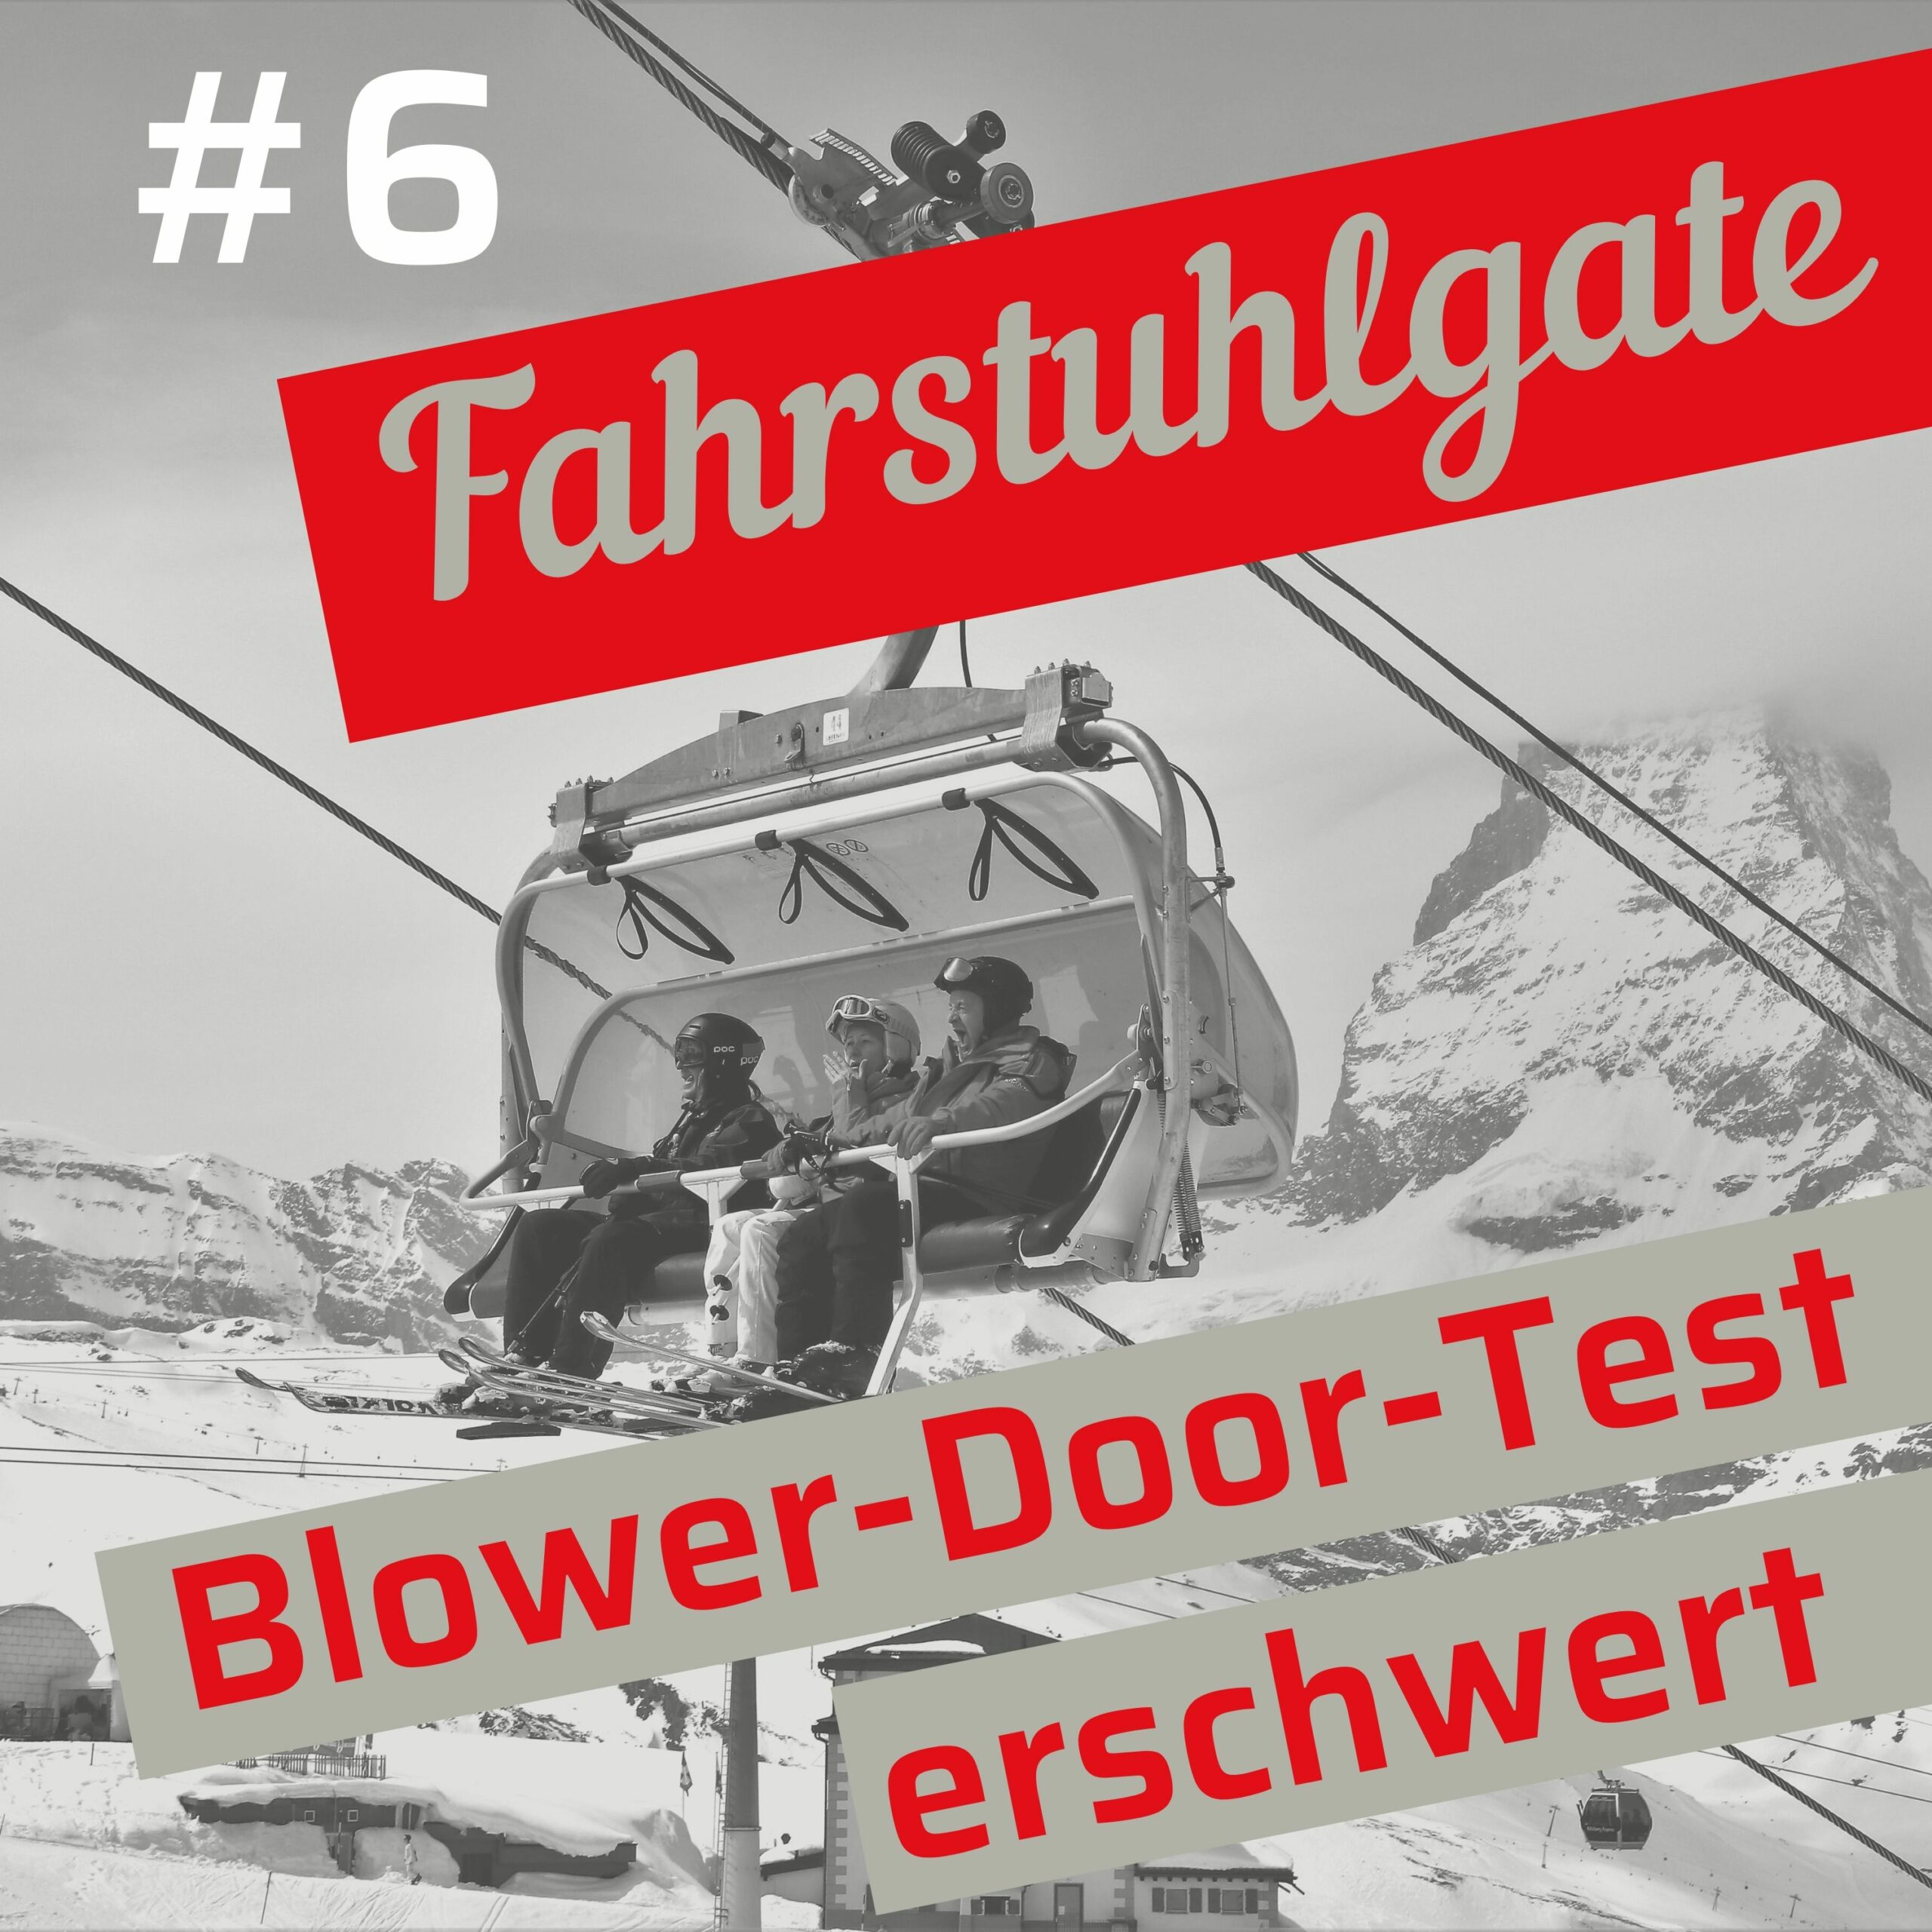 #6 Fahrstuhlgate: Blower-Door-Messung erschwert - Achtung das GEG kommt Blower-Door-Test und Gebäudepräparation: das GEG verbietet bestimmte Abklebungen